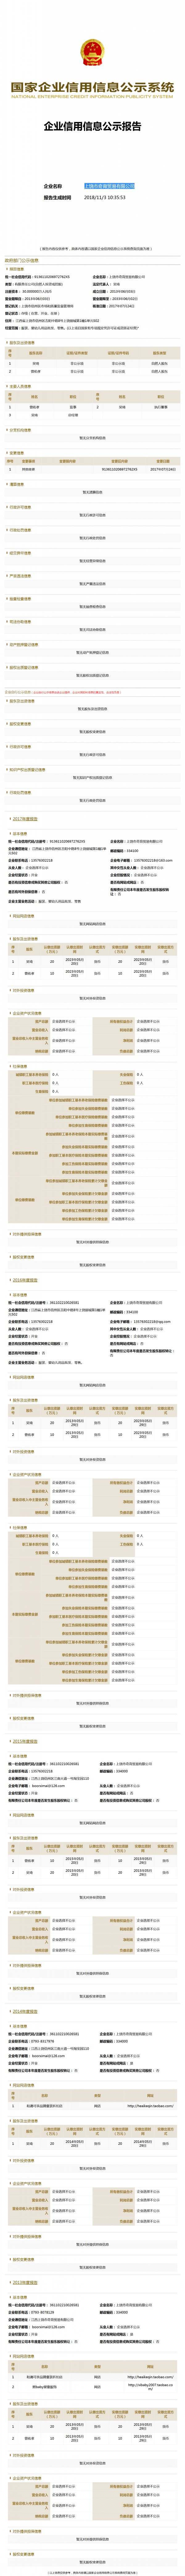 conew_上饶市奇育贸易有限公司[1]